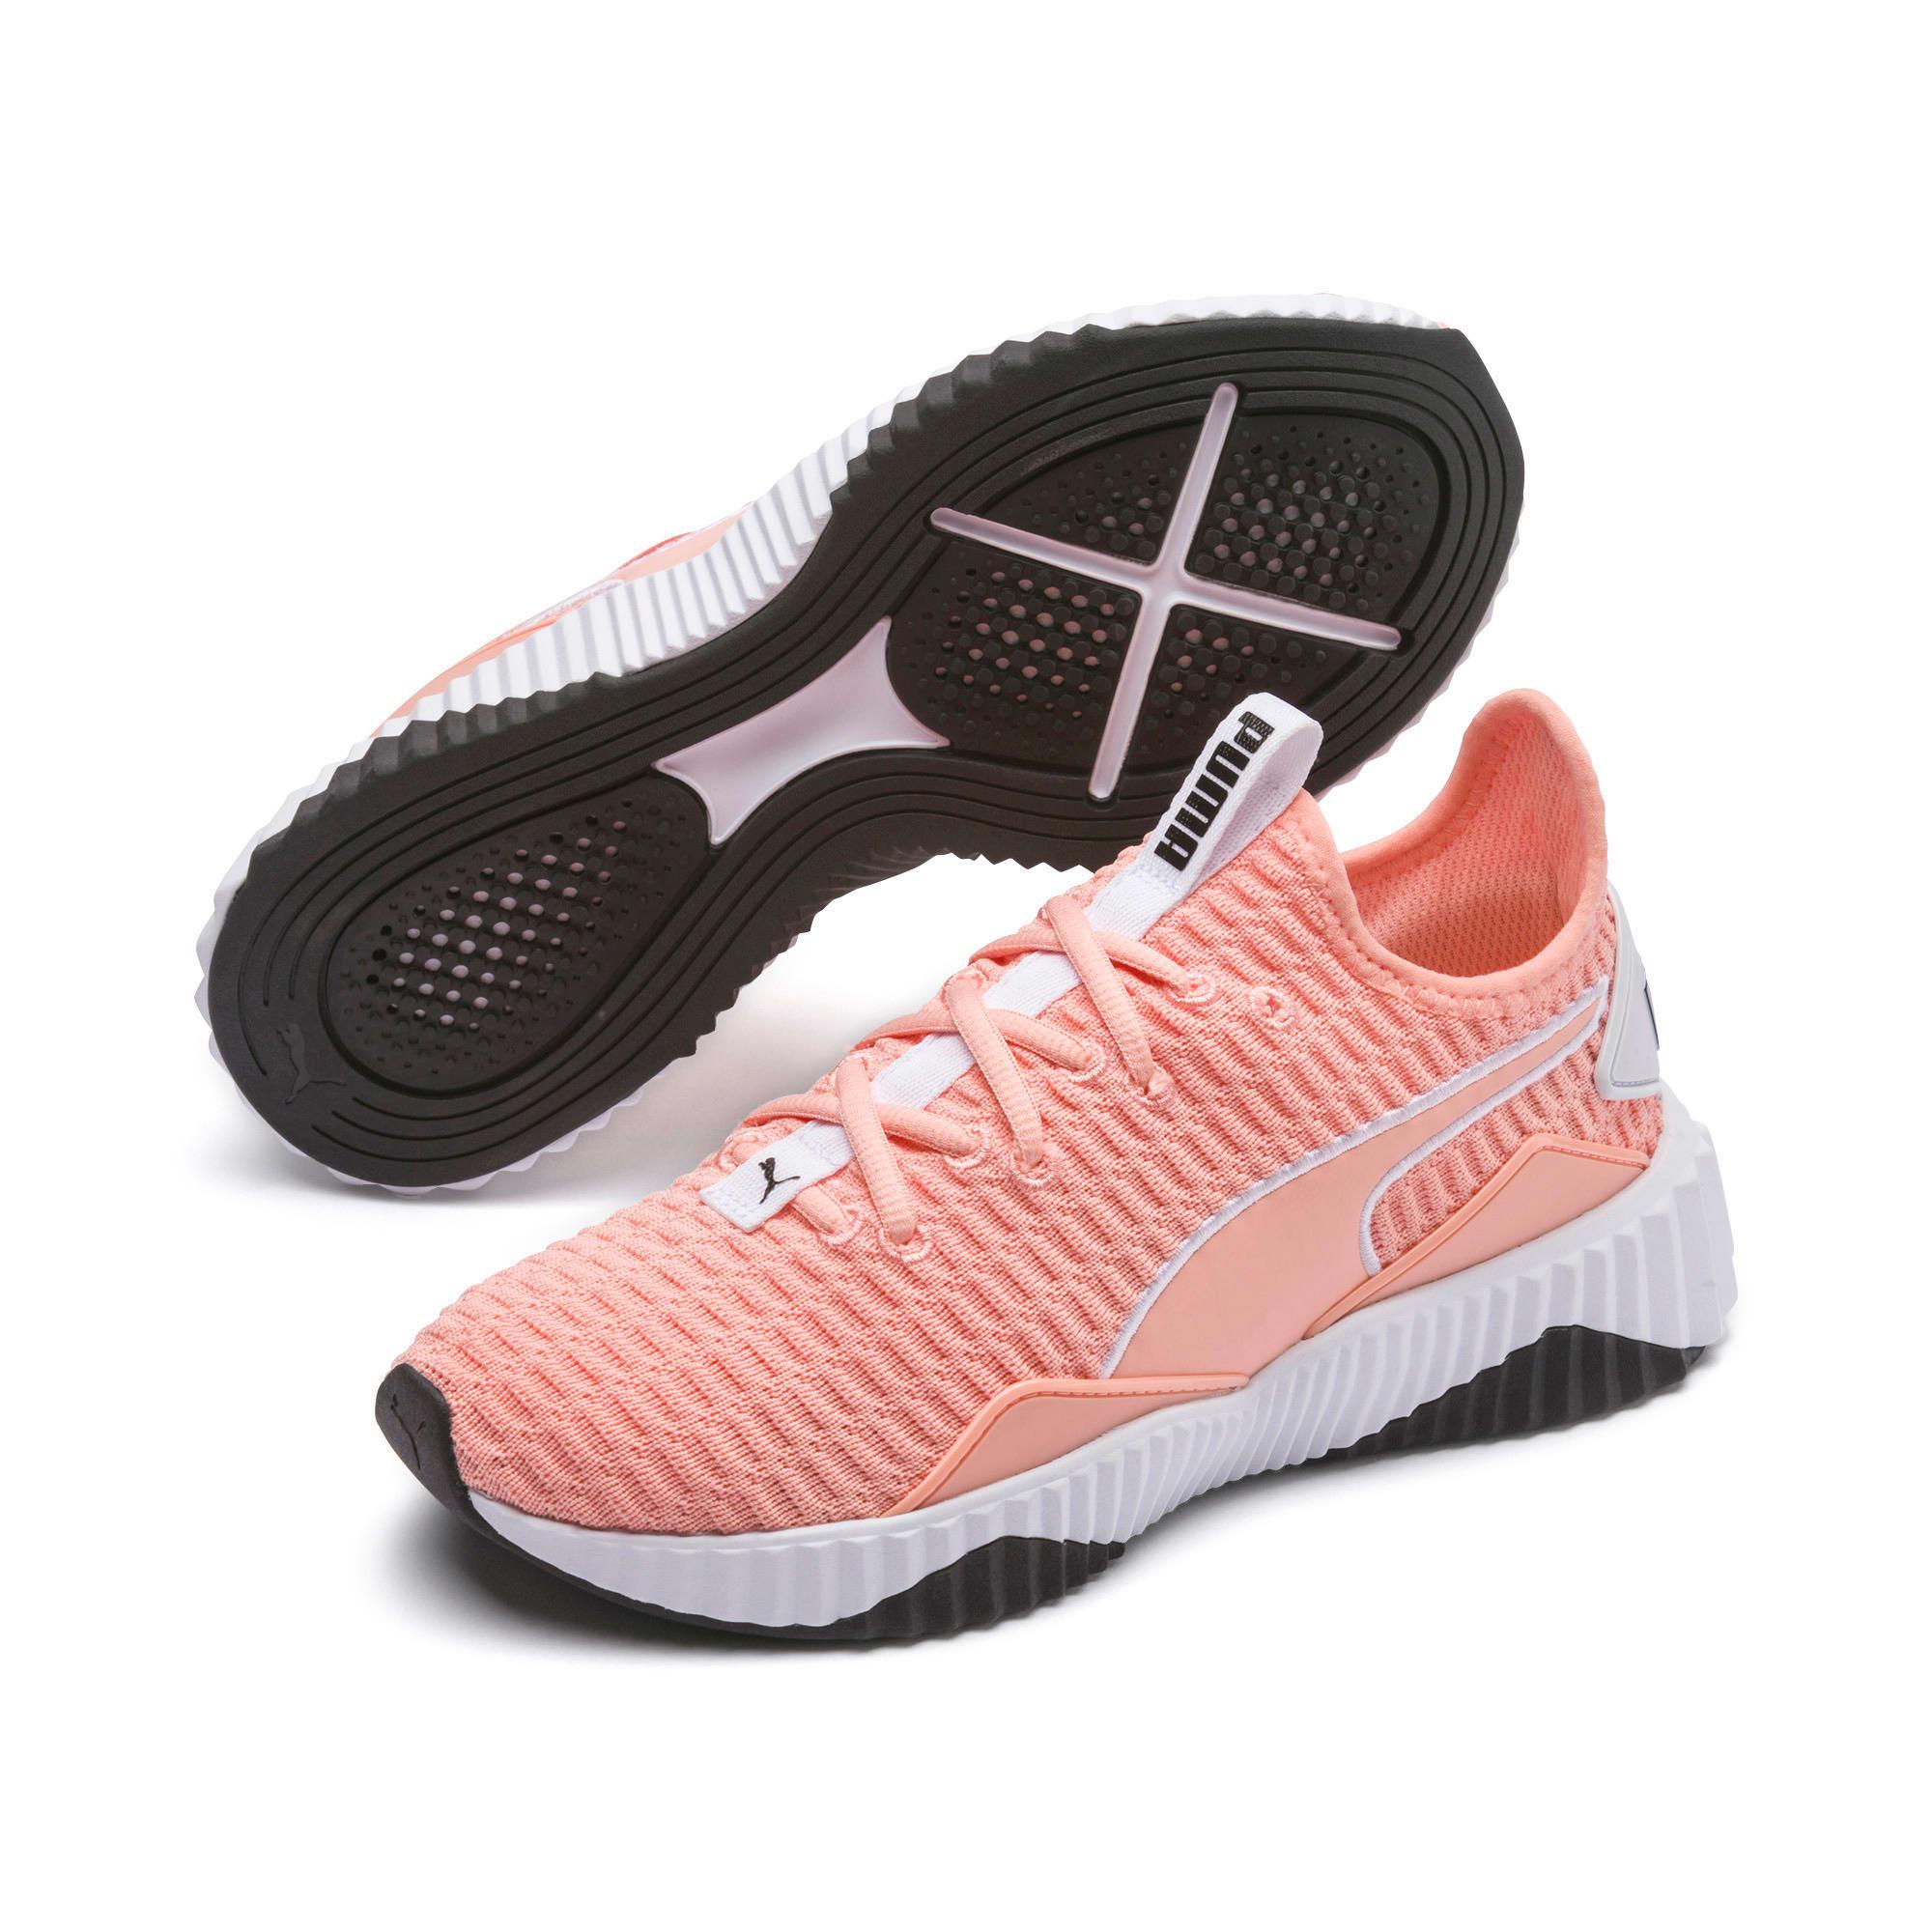 Thumbnail 3 of Defy Damen Sneaker, Peach Bud-Puma White, medium